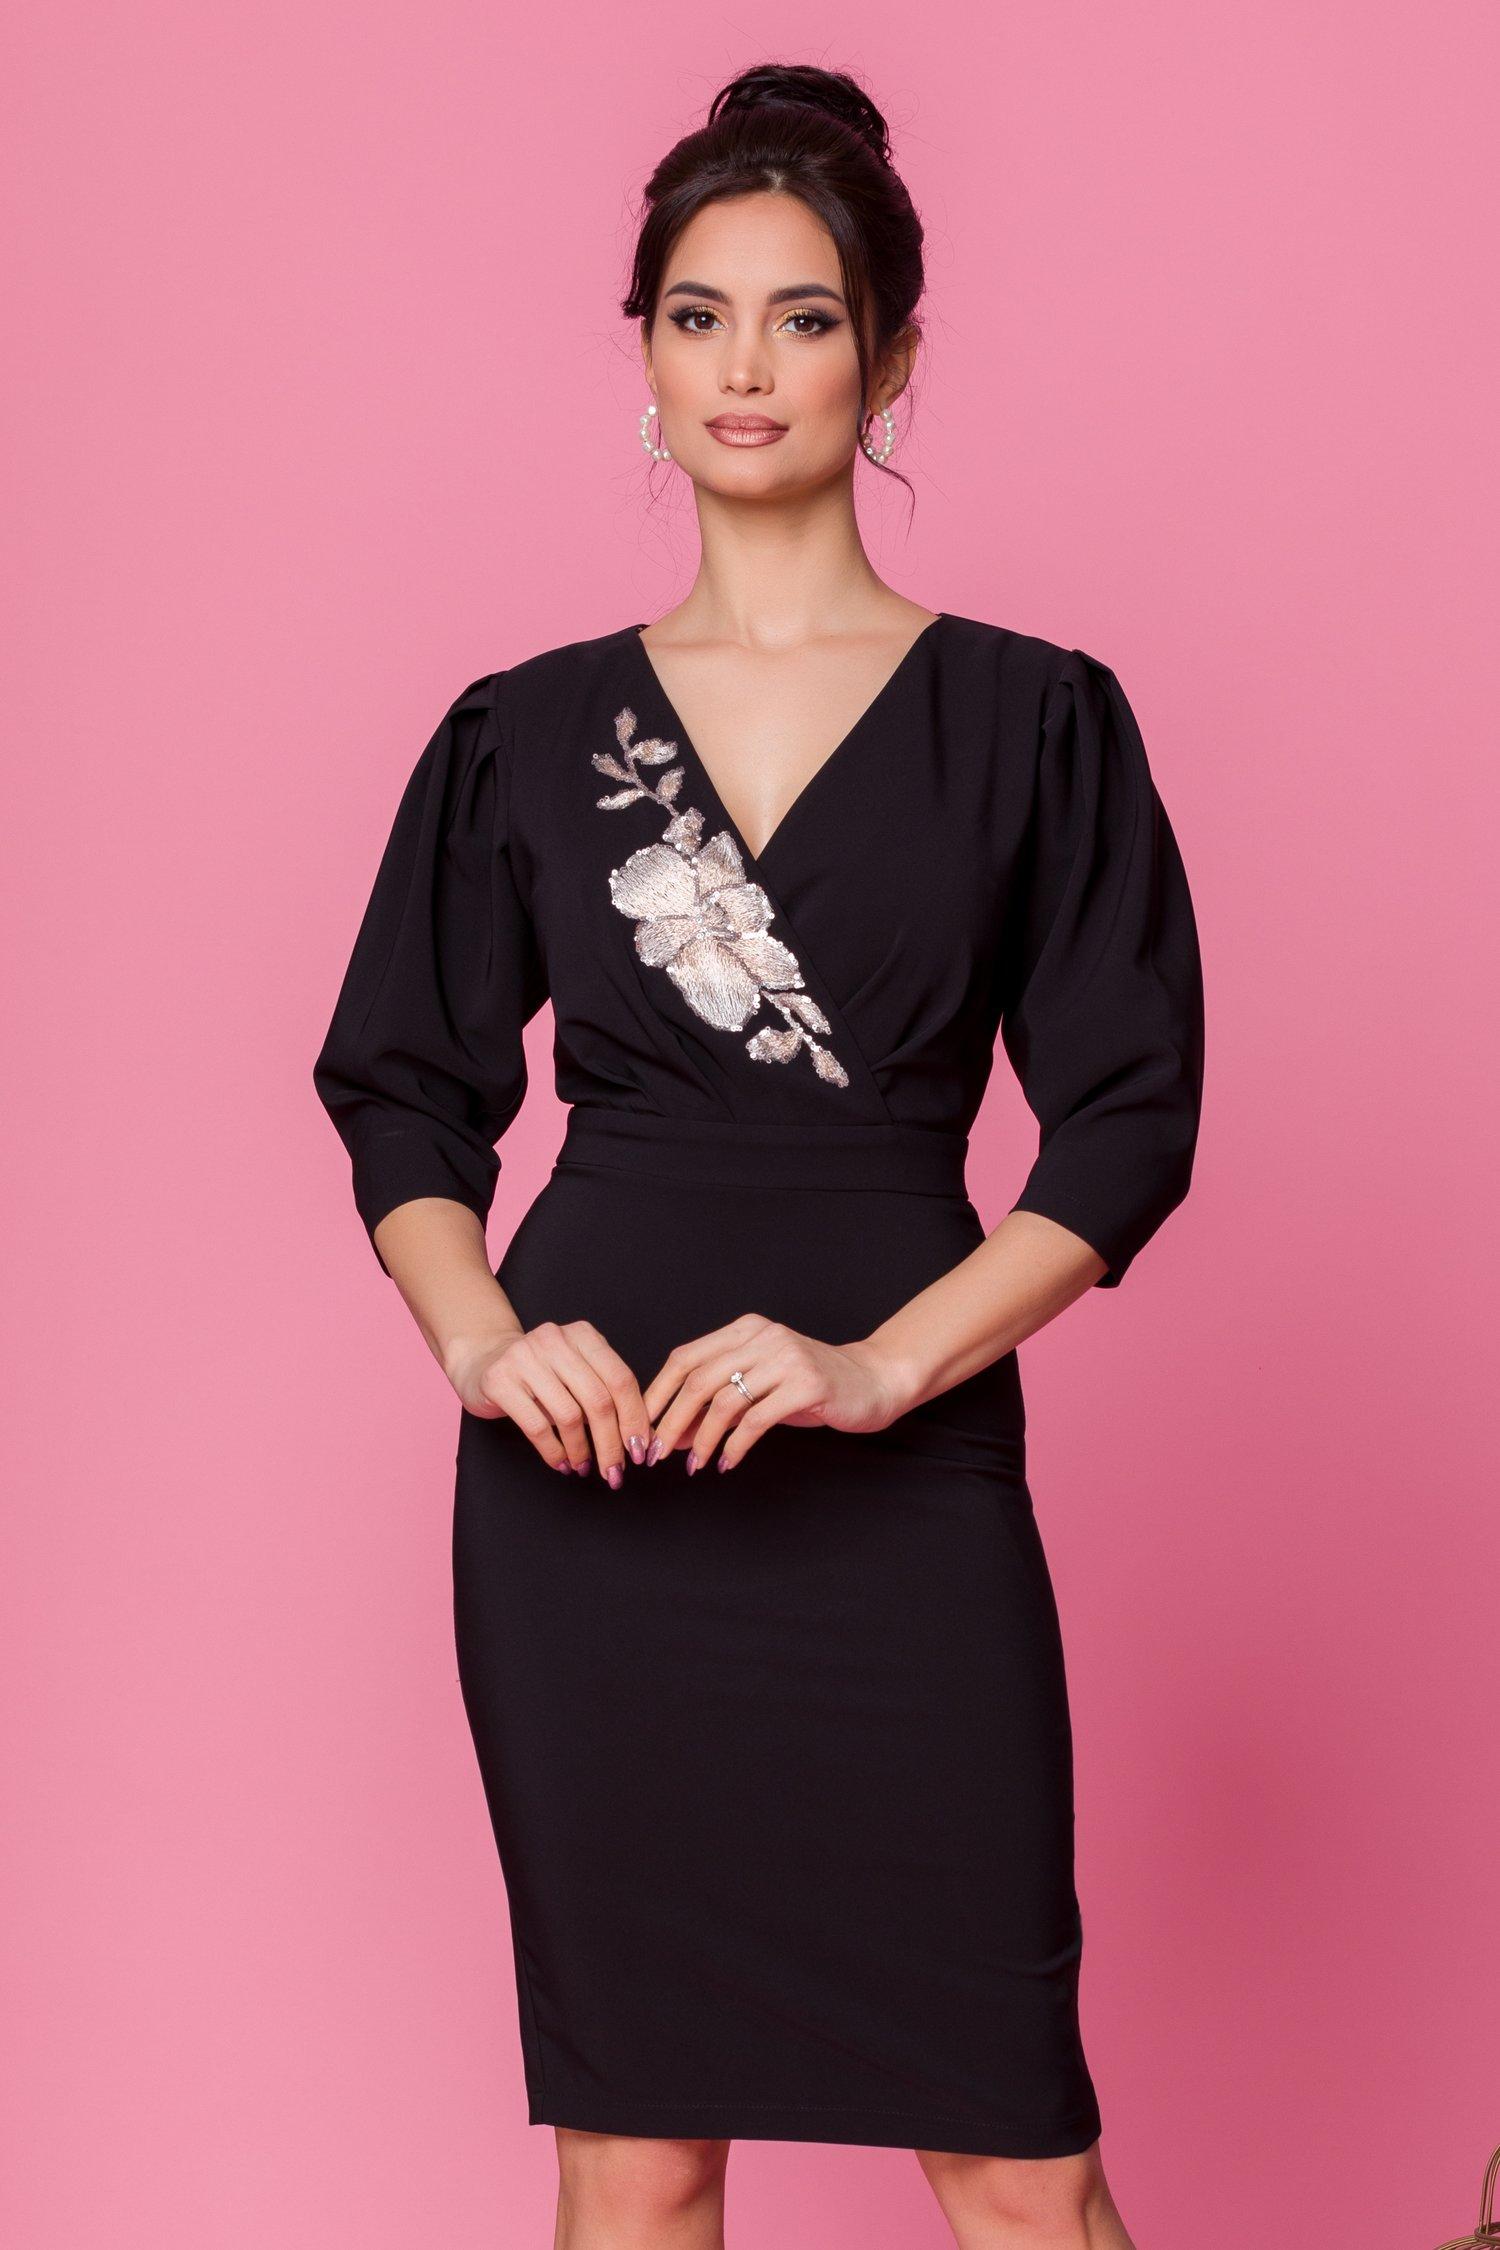 rochie ladonna neagra cu decolteu petrecut accesorizat cu broderie 487524 4